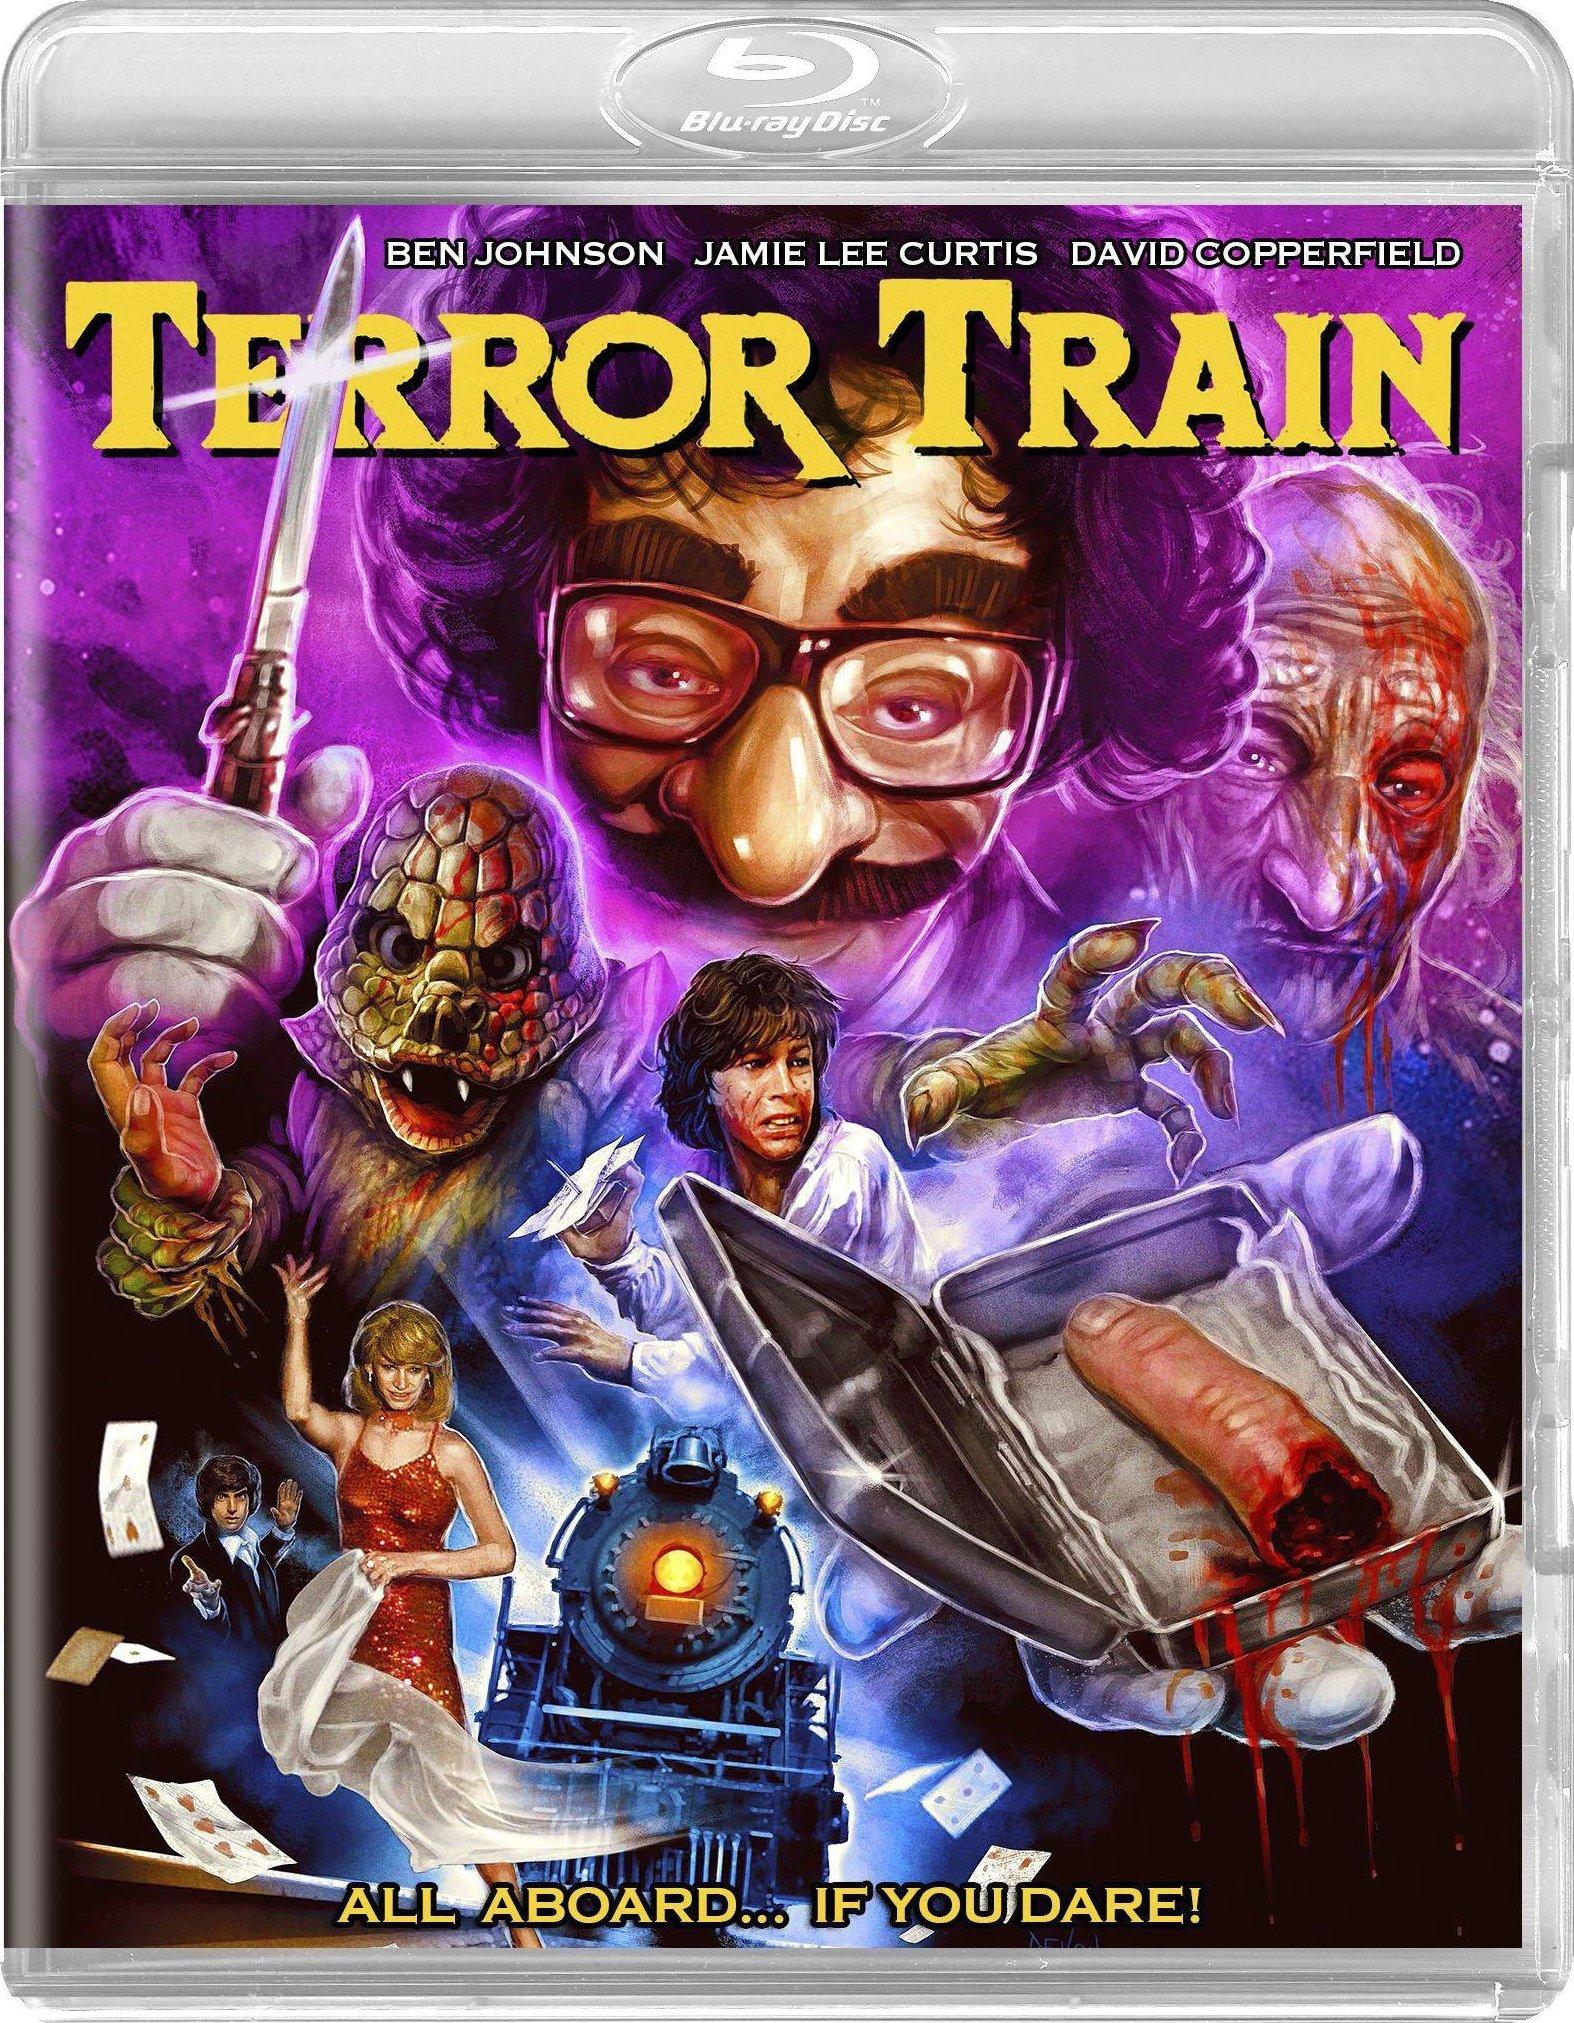 terror train 1980 full movie online